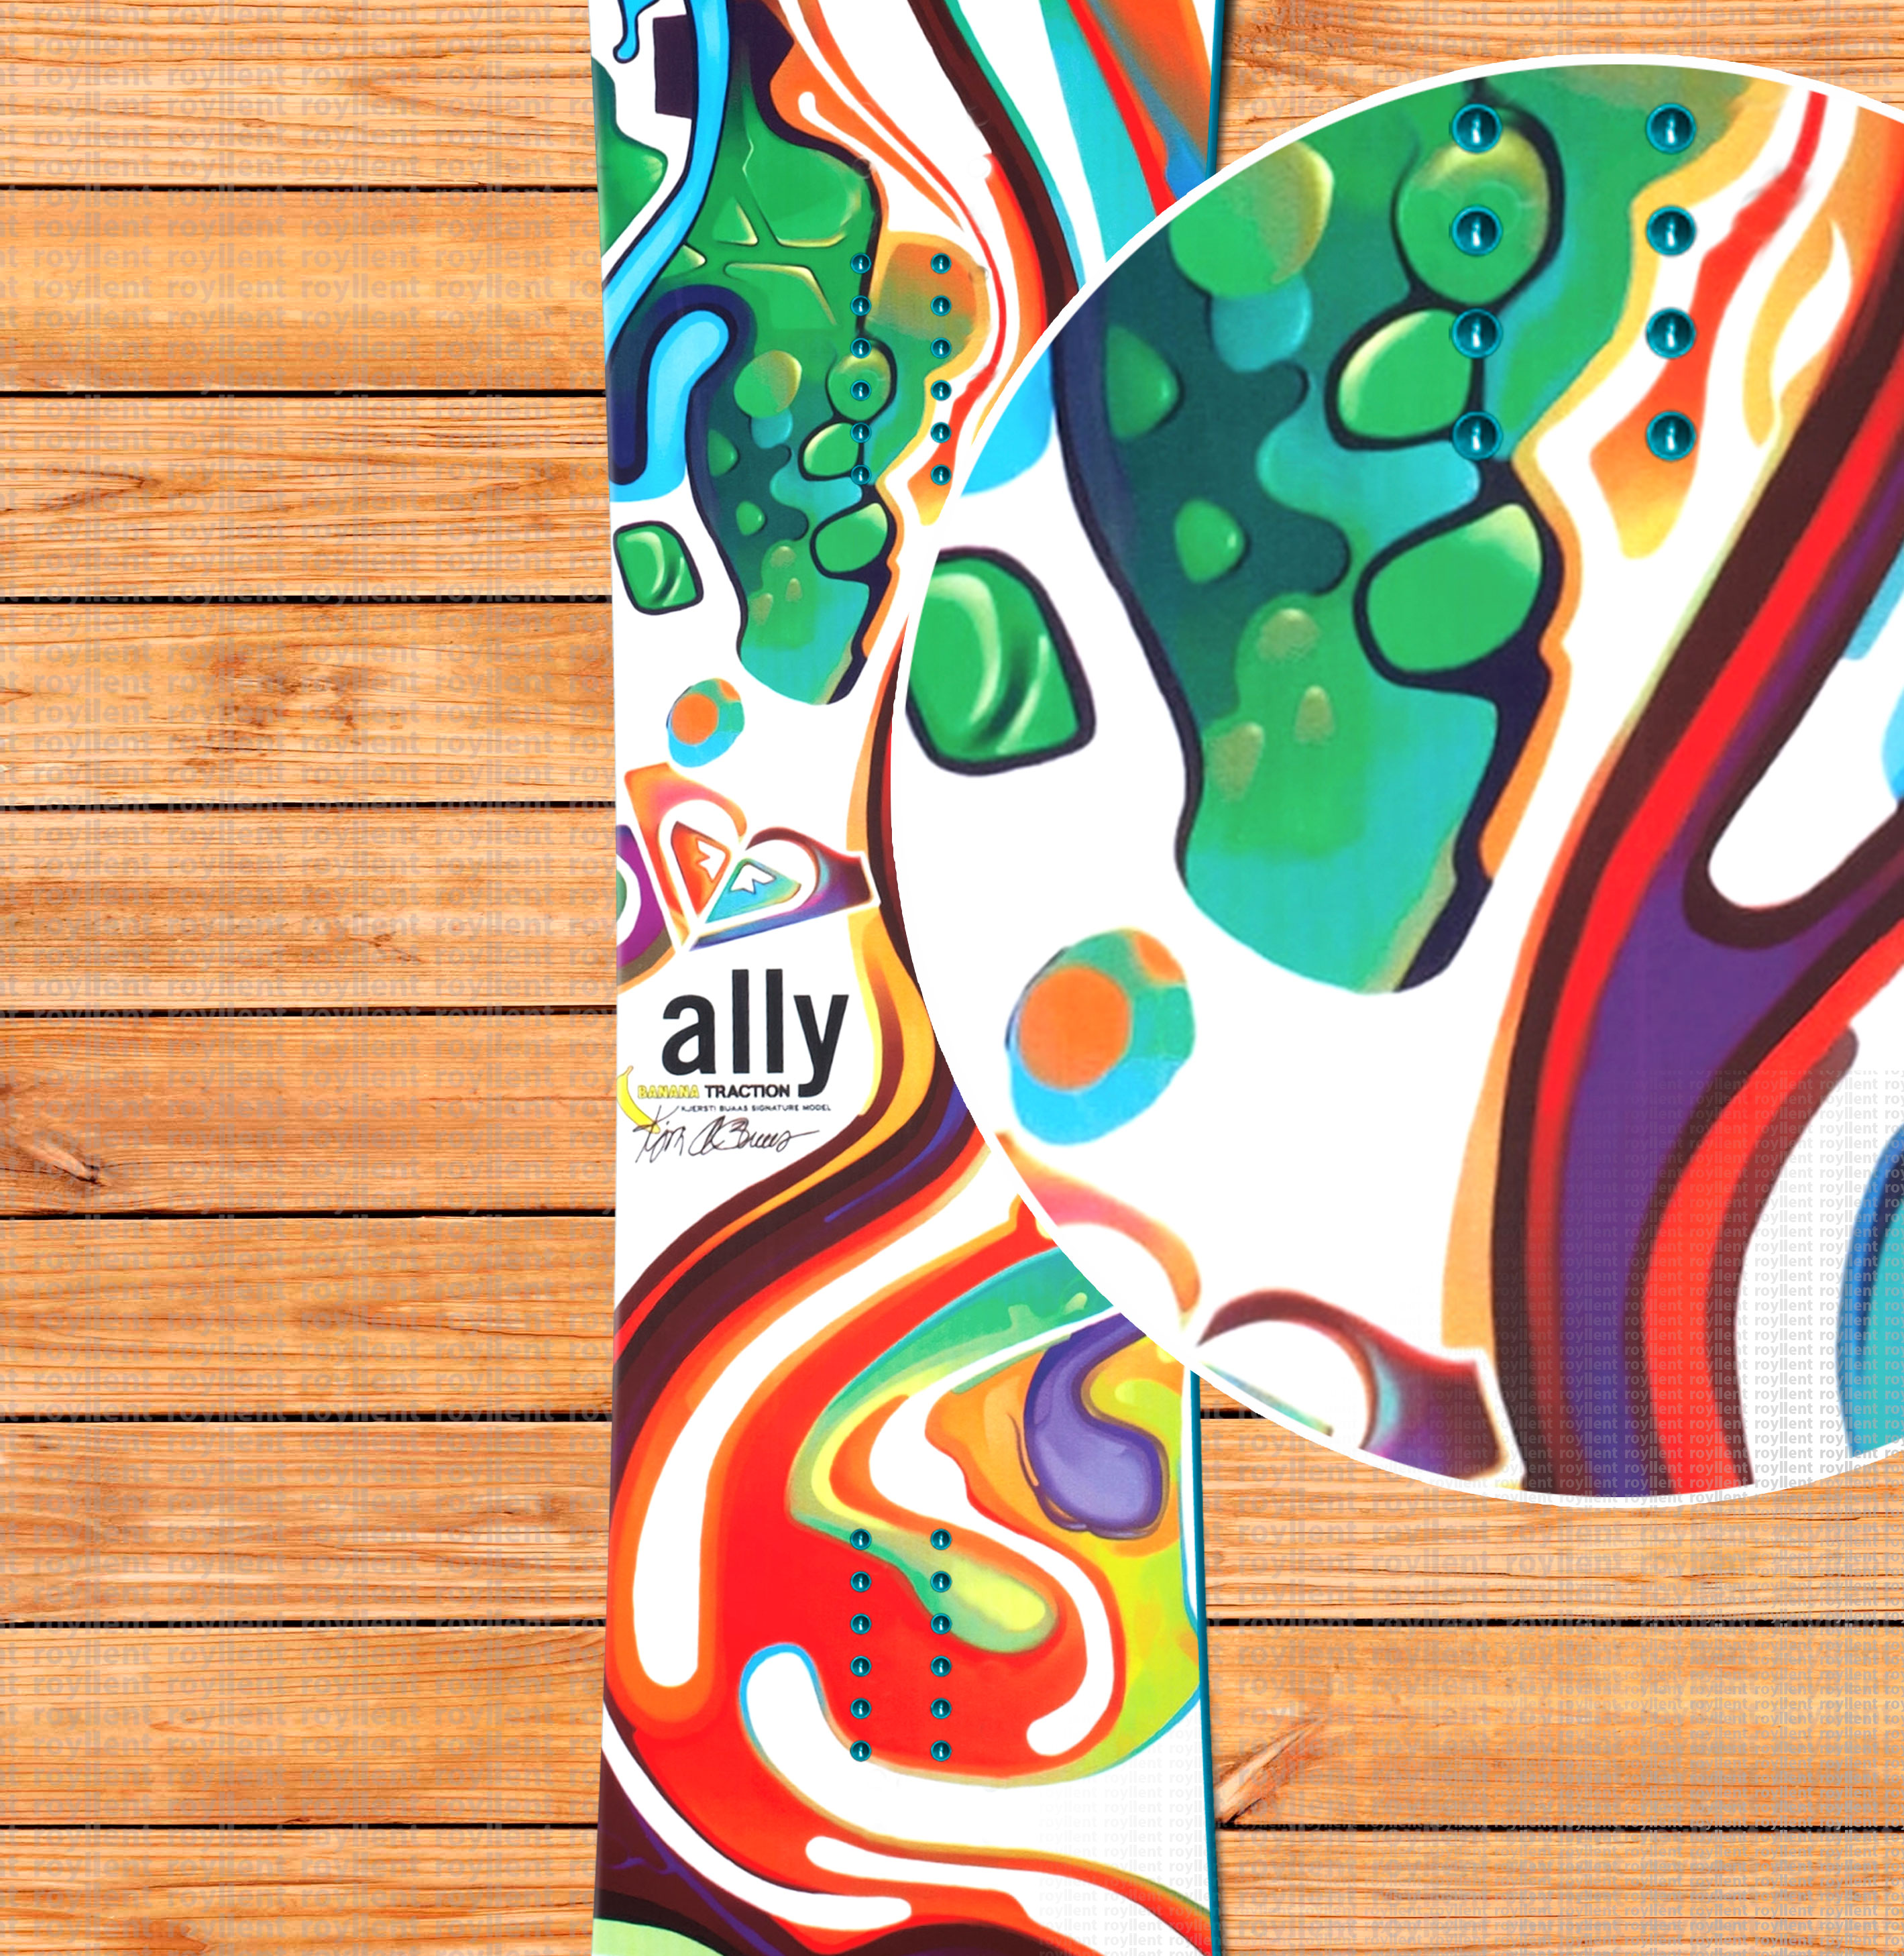 купить Roxy Ally BTX snowboard